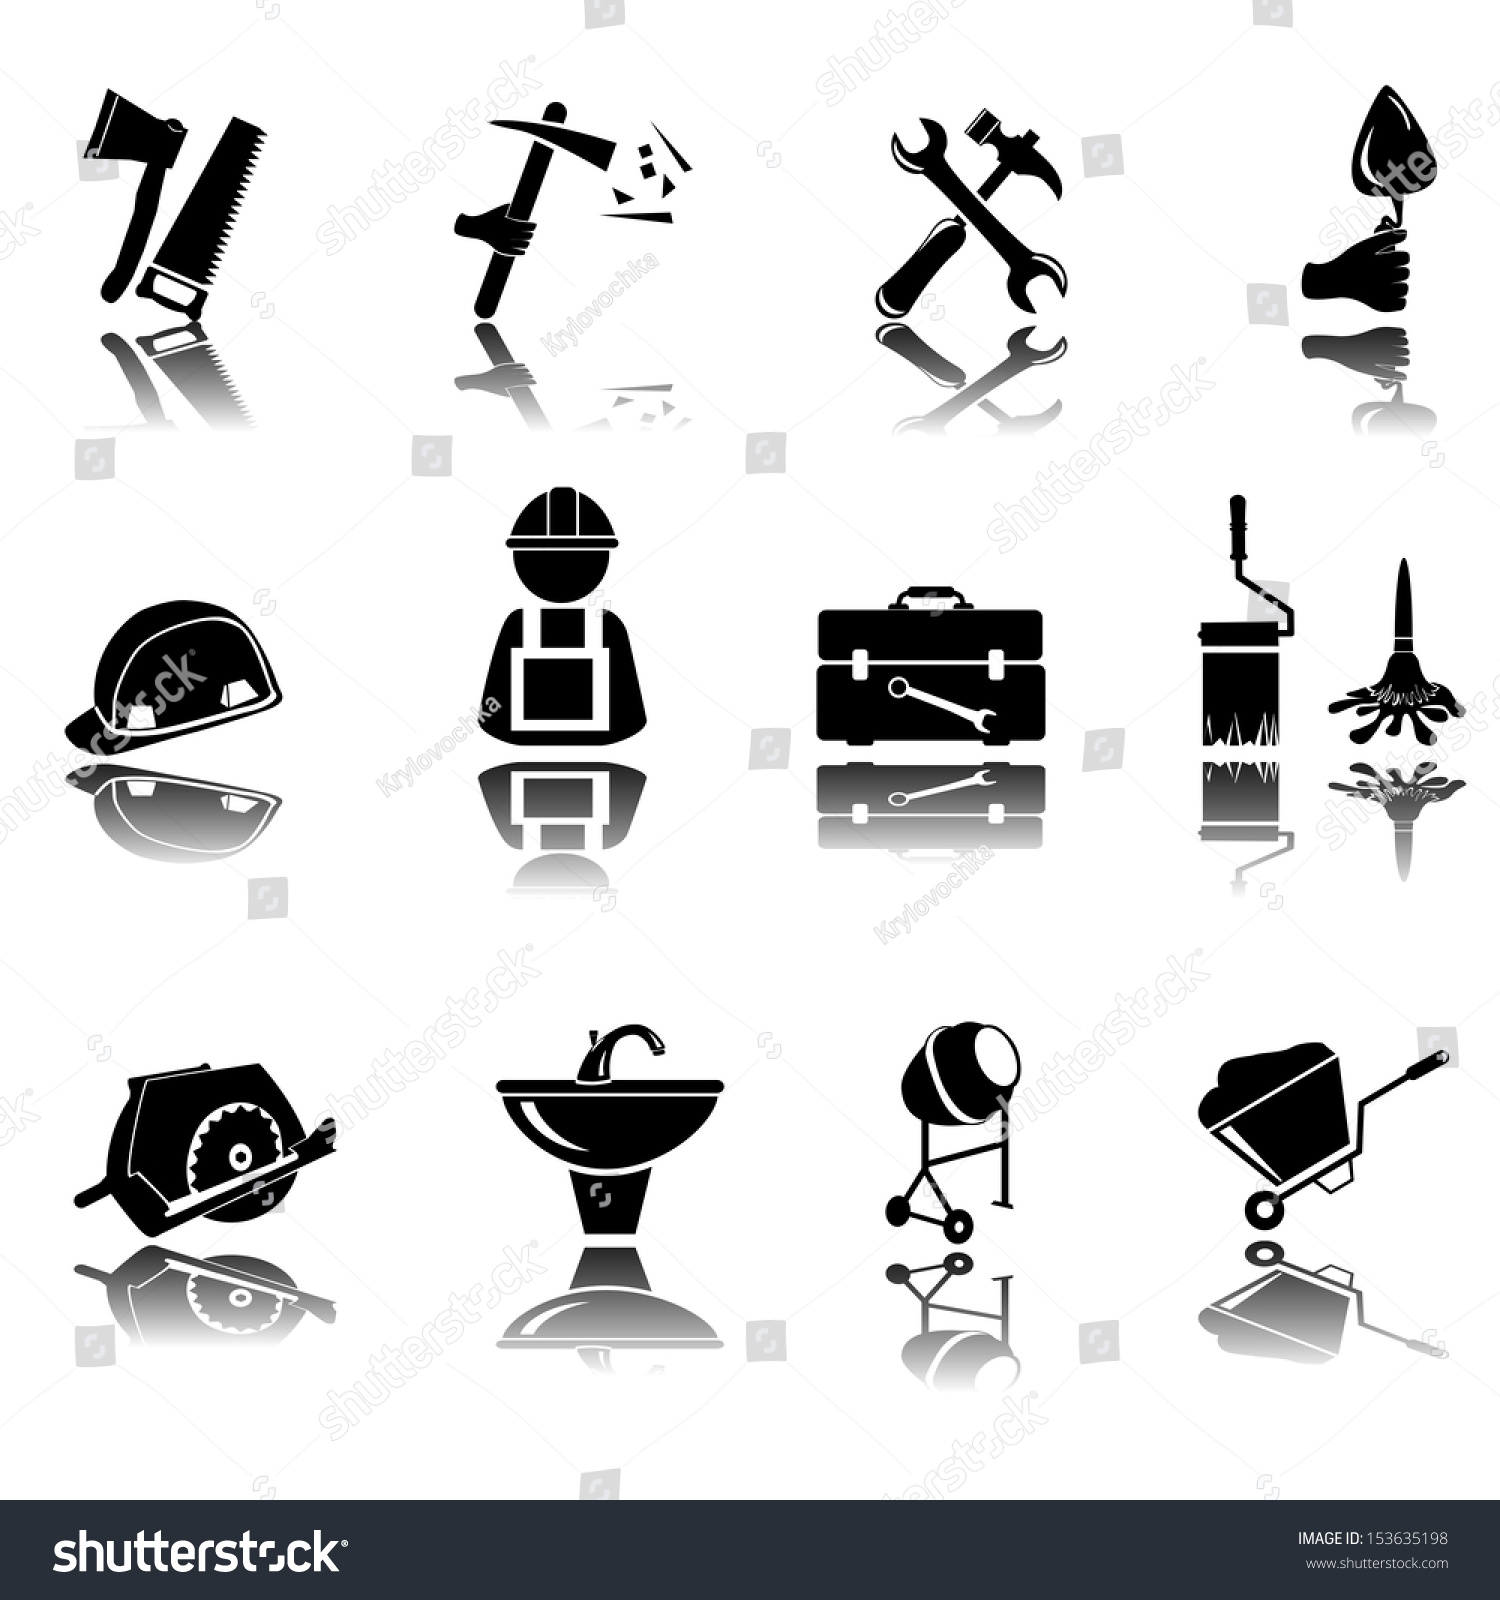 Construction do yourself black silhouette icon stock vector construction and do it yourself black silhouette icon button set solutioingenieria Images